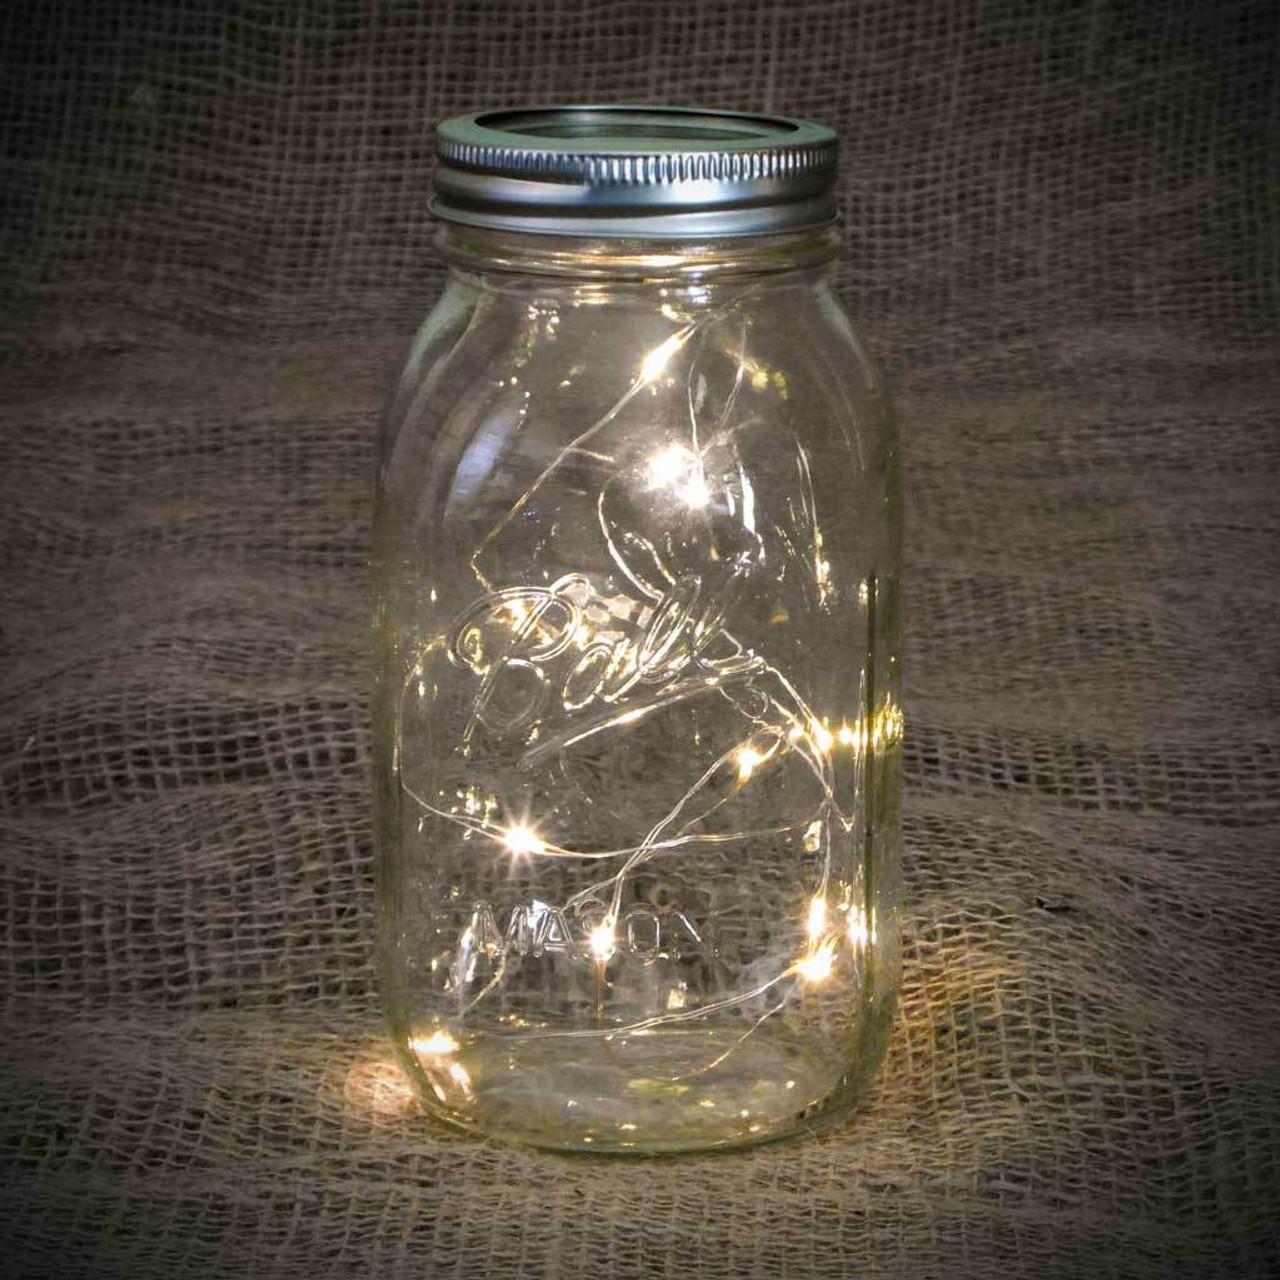 32oz Mason Jar with Warm White Fairy Lights